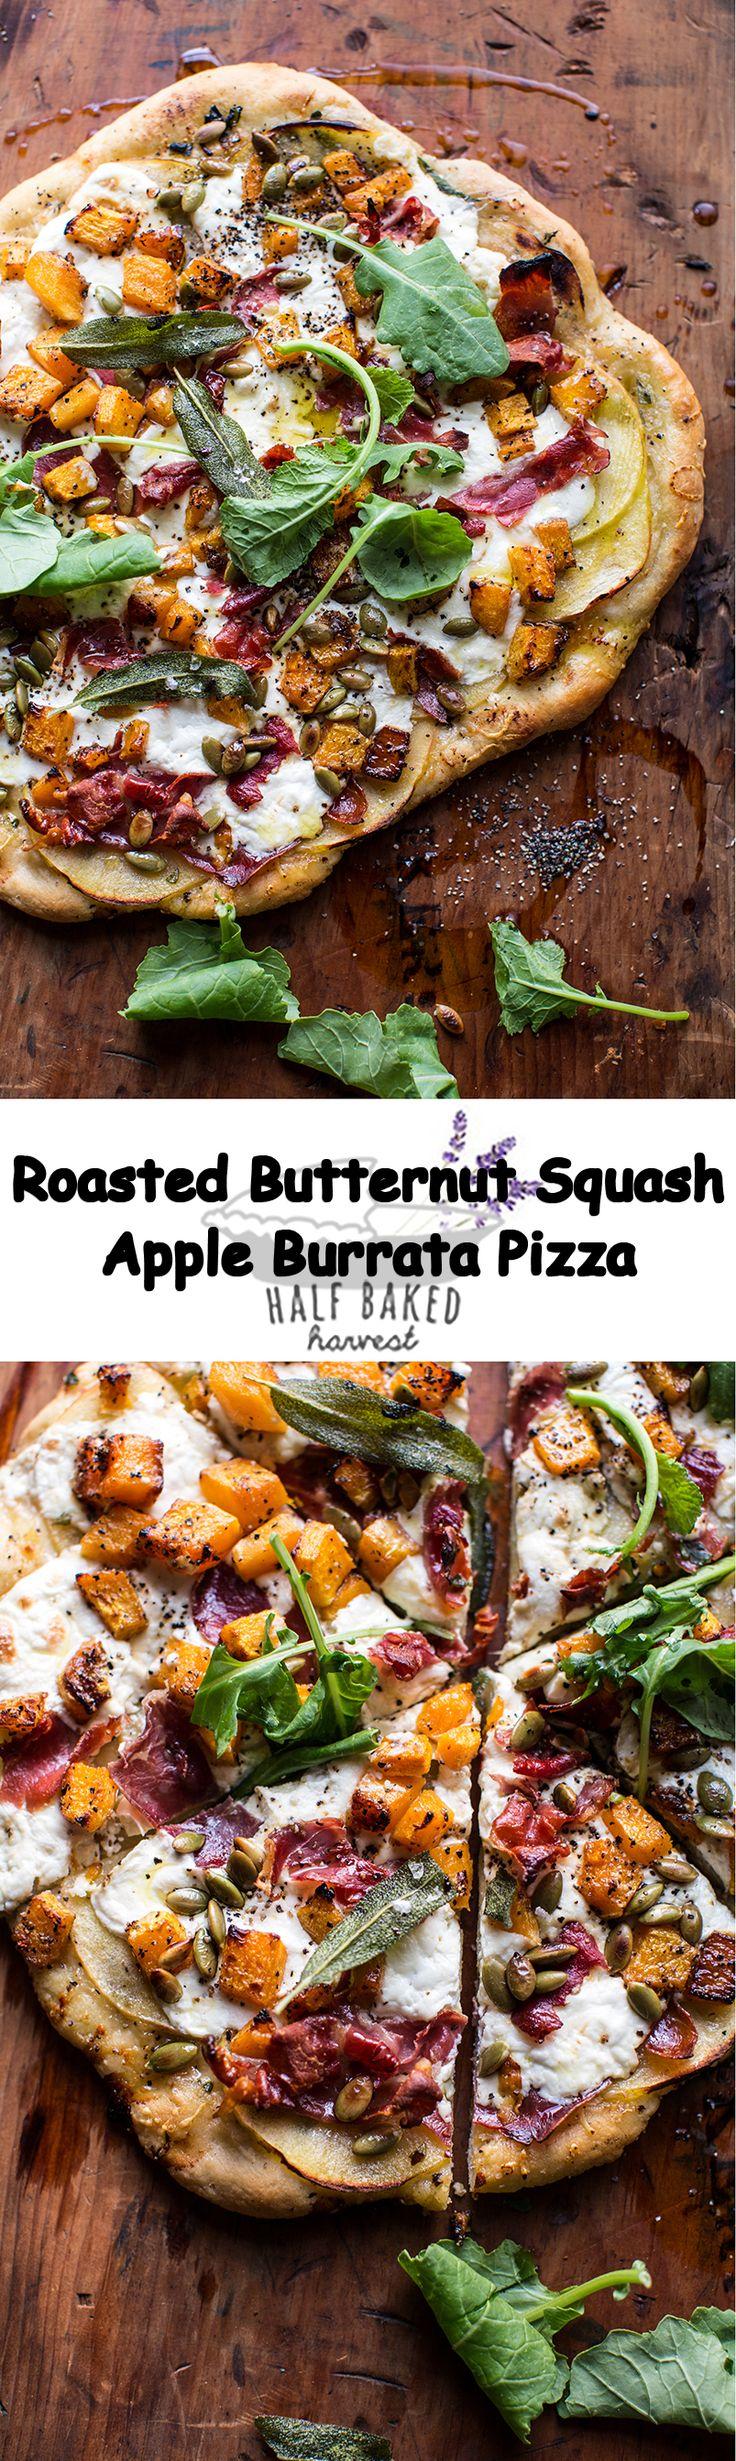 Roasted Butternut Squash Apple Burrata Pizza | halfbakedharvest.com @hbharvest